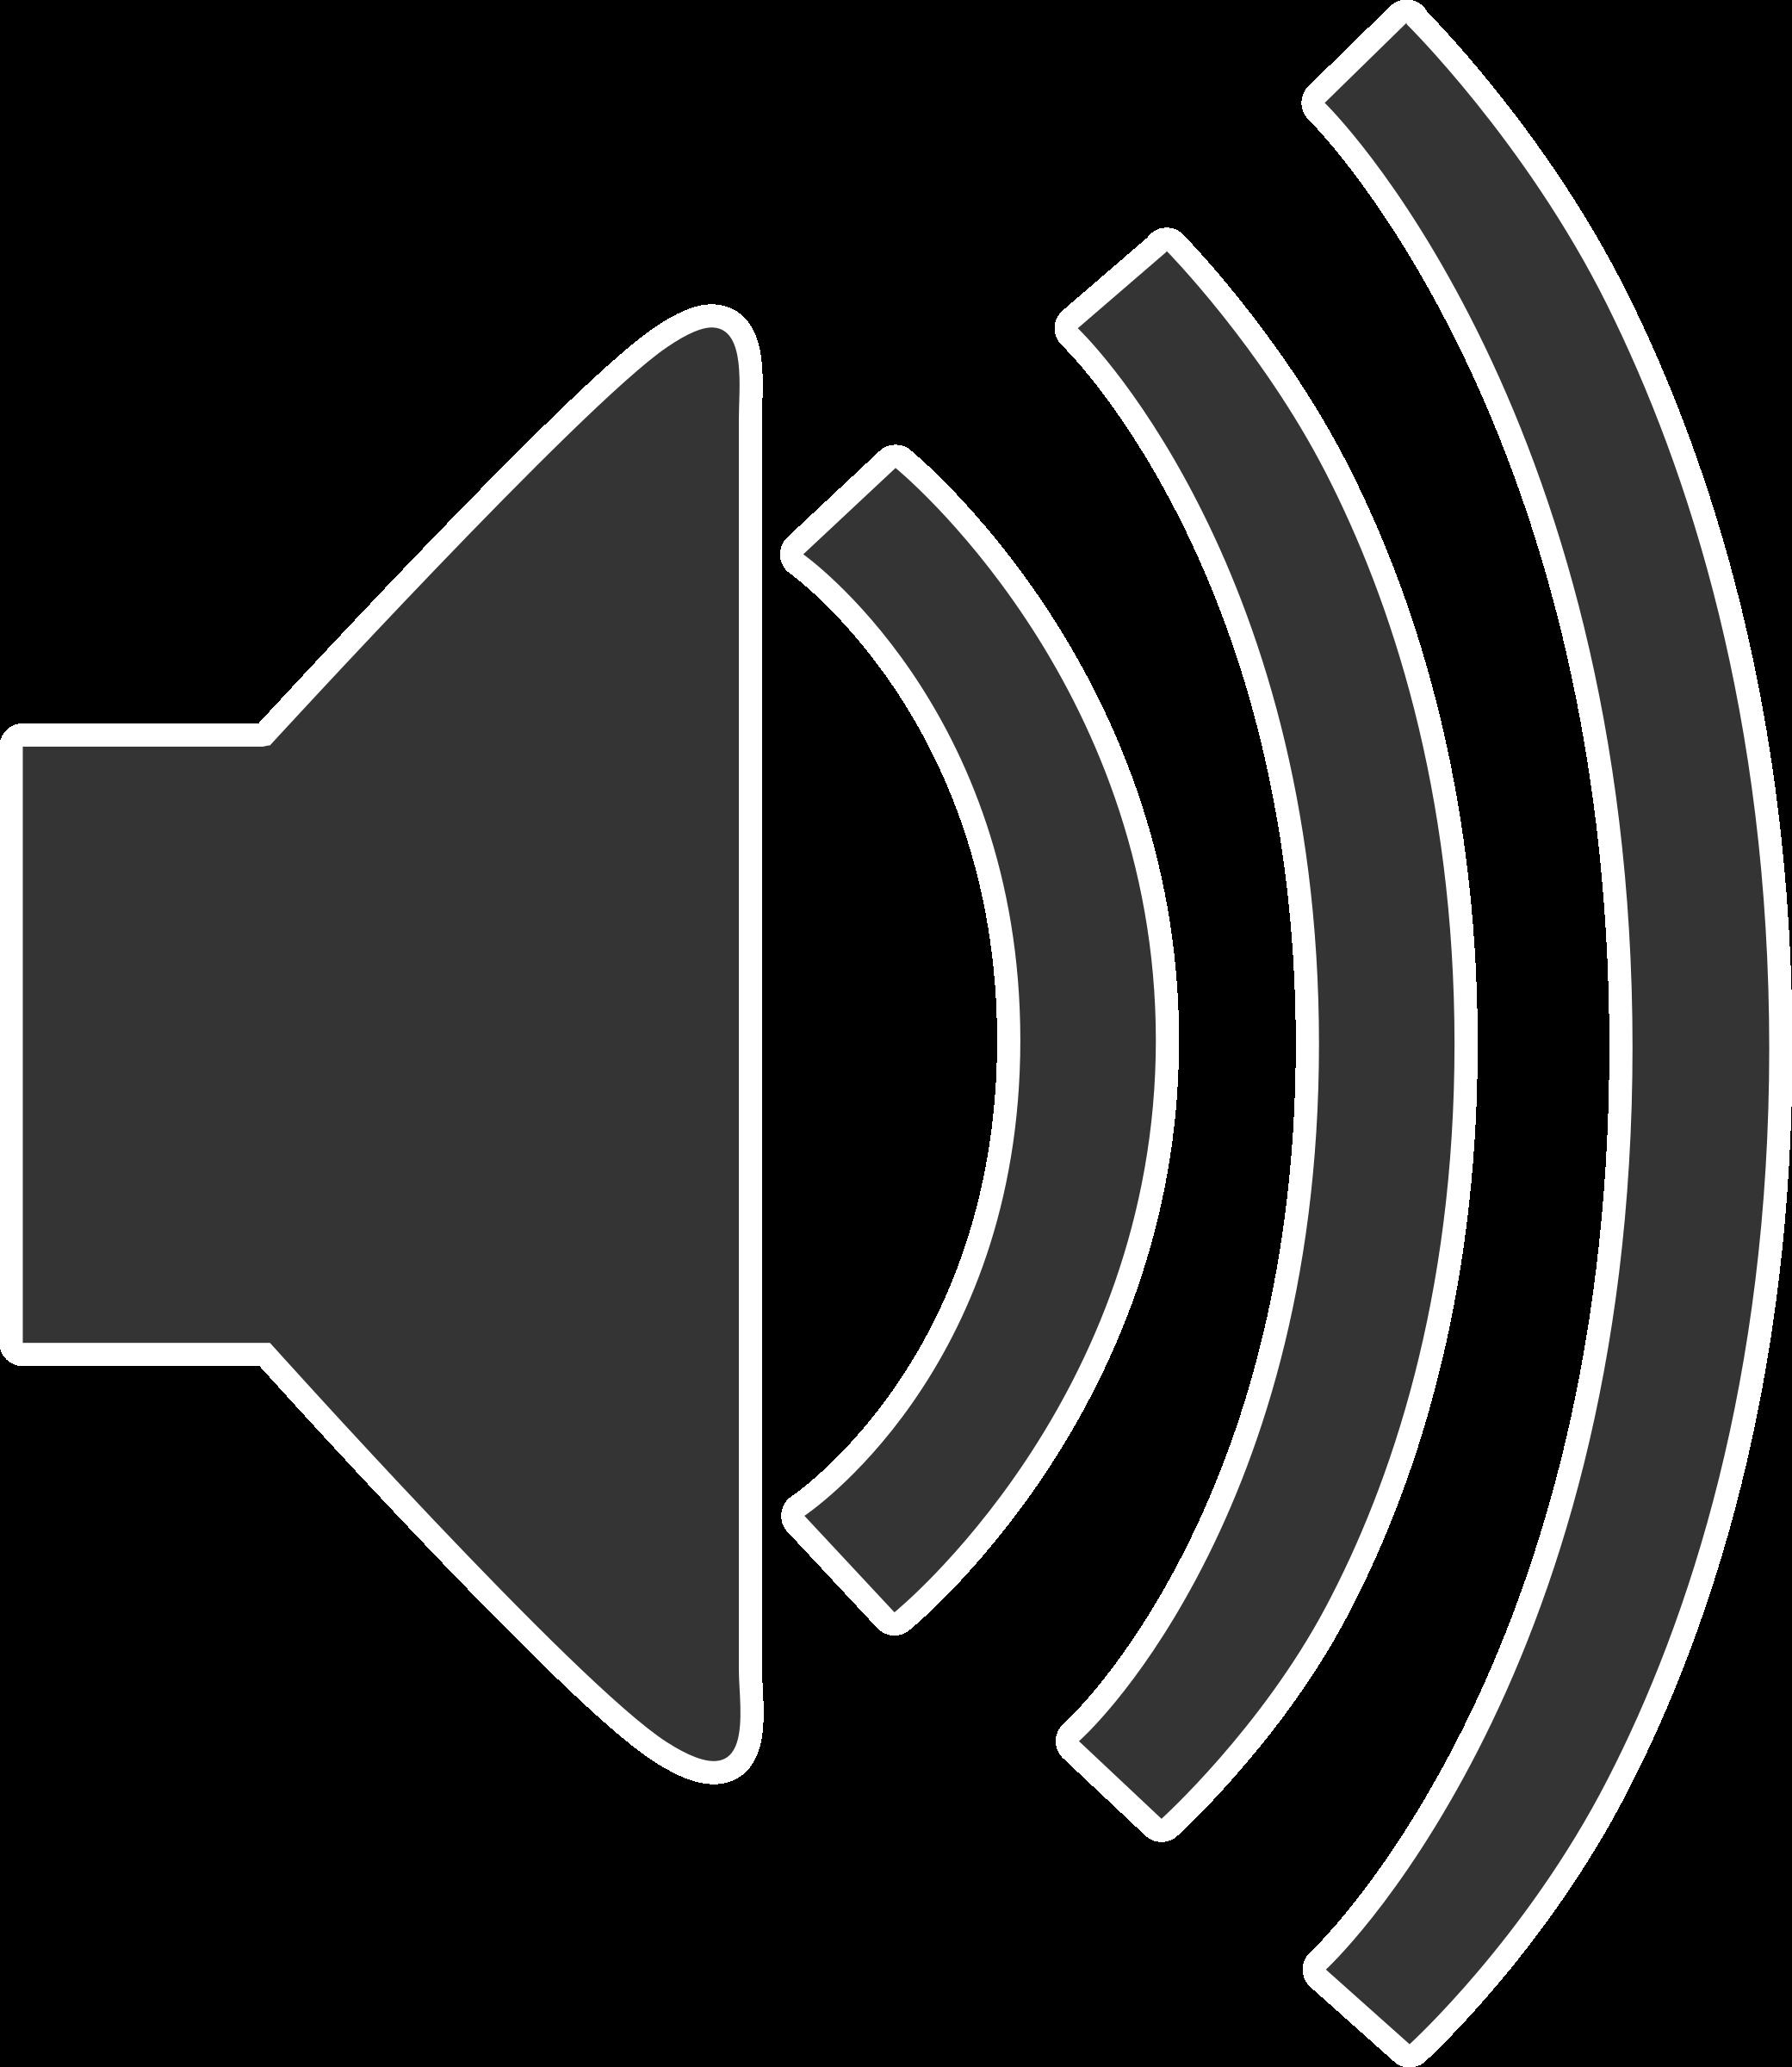 Speaker Icon Clip Art. BIG IMAGE (PNG)